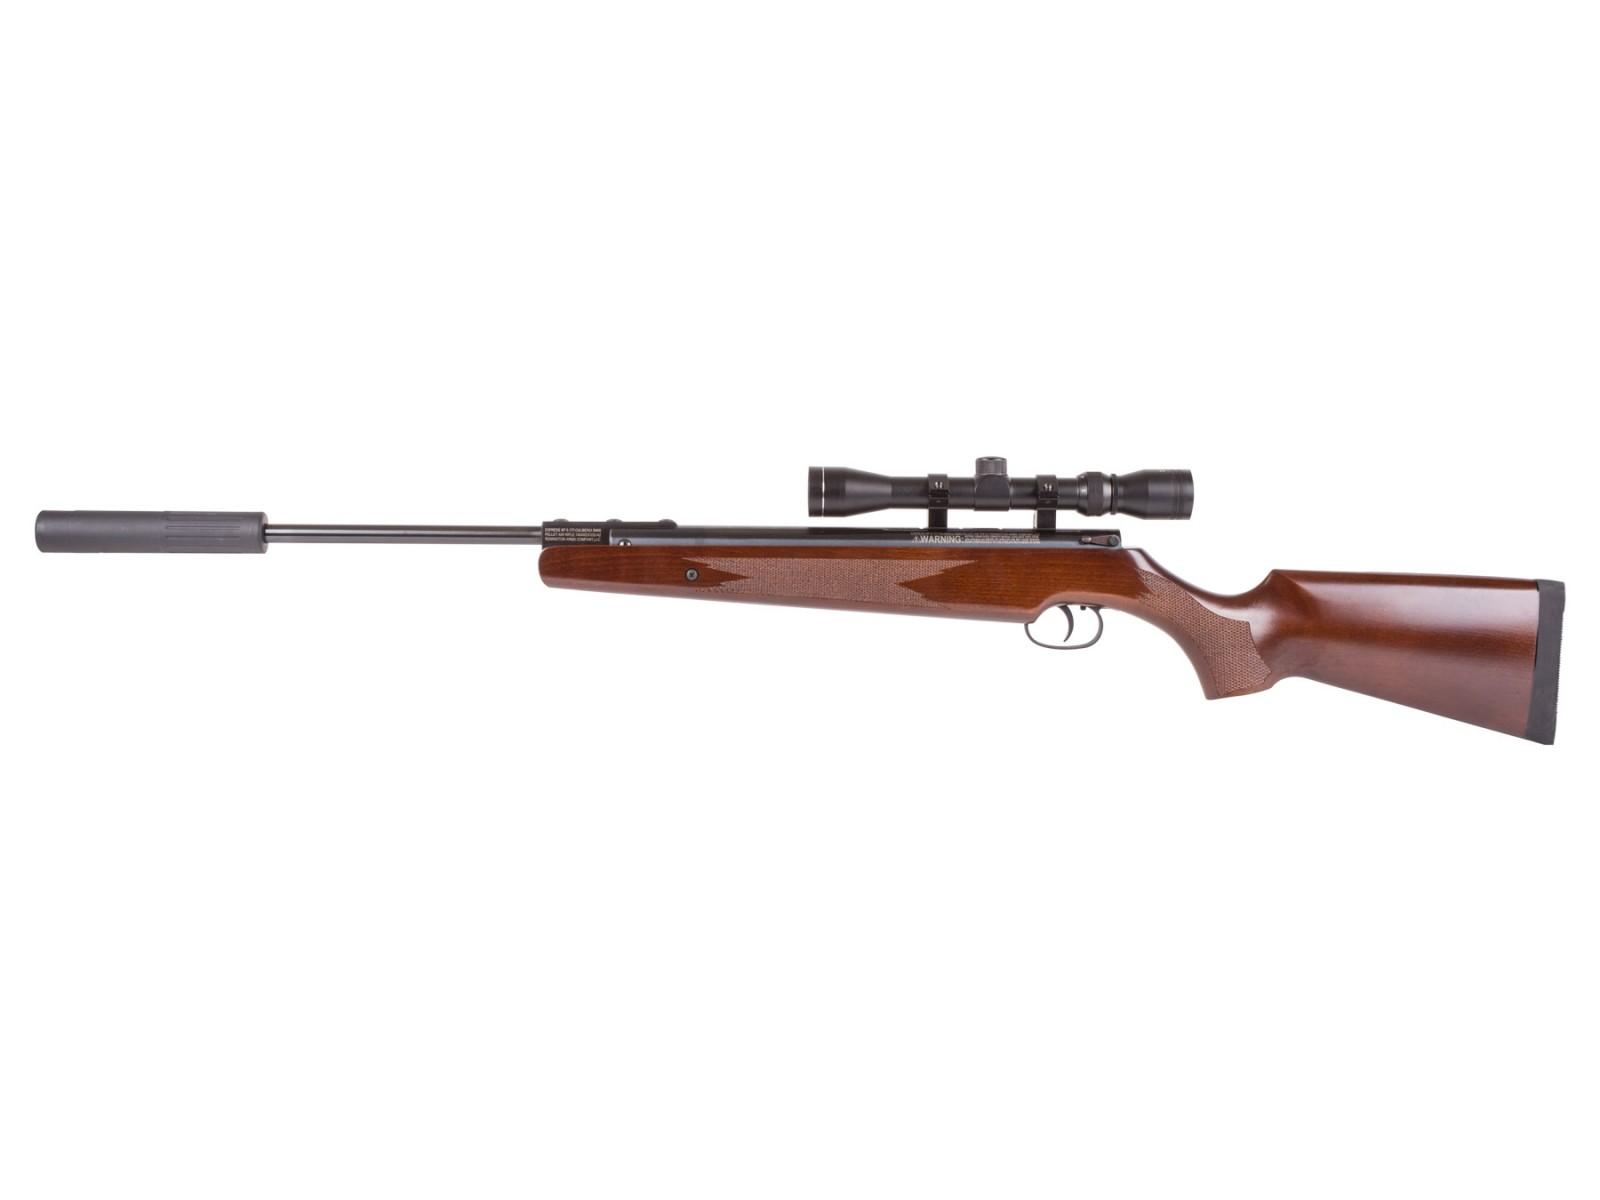 Remington Express XP Air Rifle